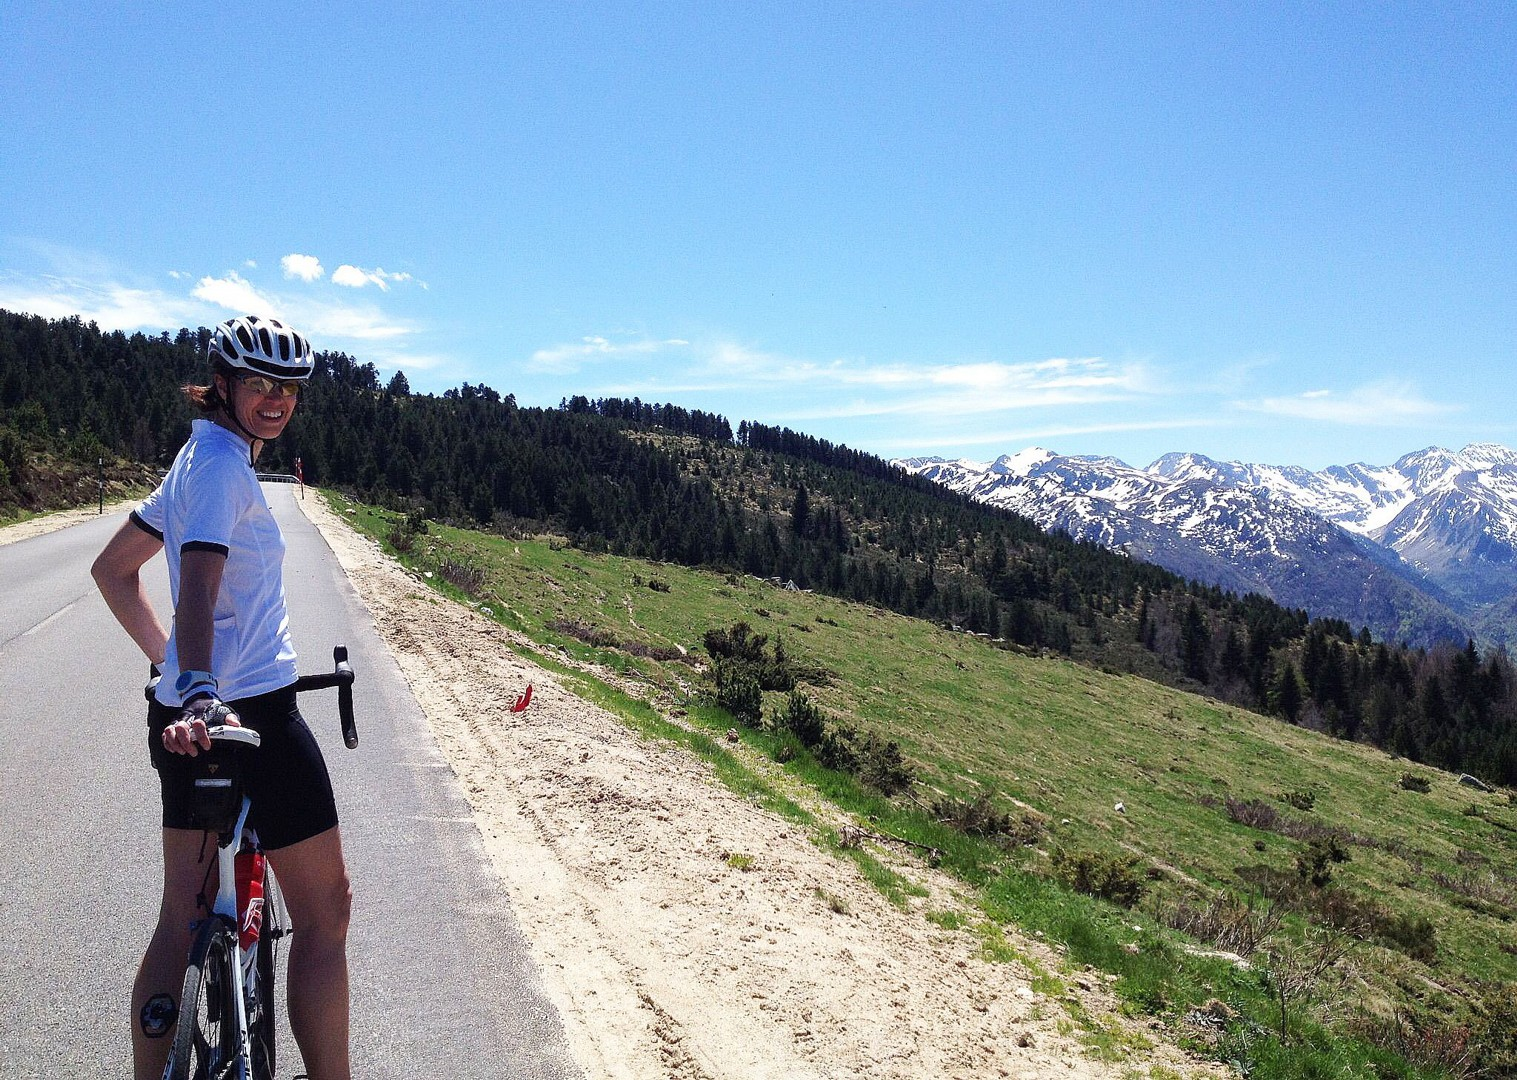 france-pyrenee-fitness-week-road-cycling.jpg - France - Pyrenees Fitness Week - Guided Road Cycling Holiday (Grade 3-4) - Road Cycling